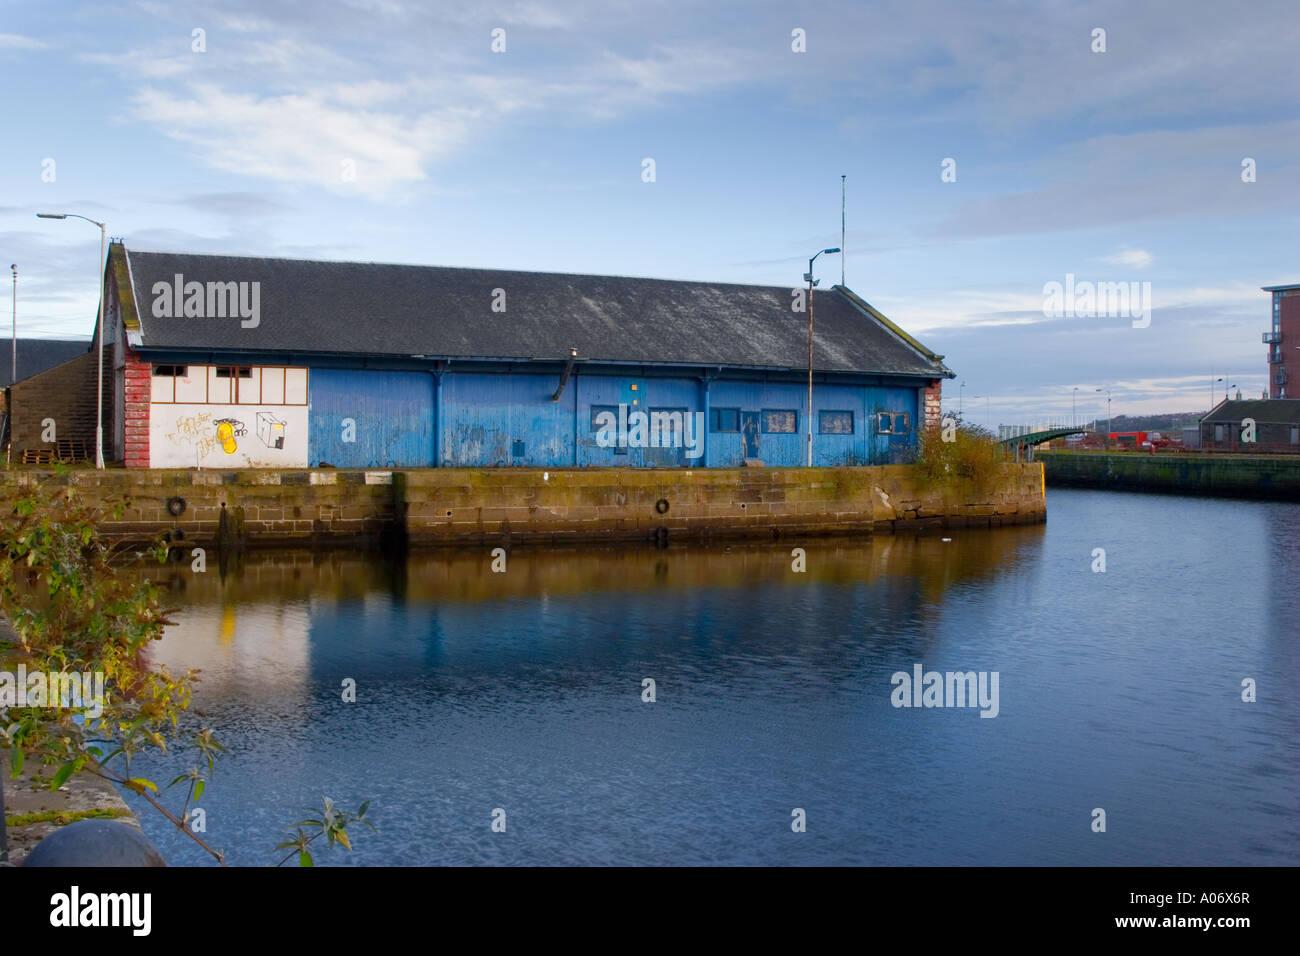 Old port facility warehouse buildings Dundee Tayside, Scotland,  UK - Stock Image